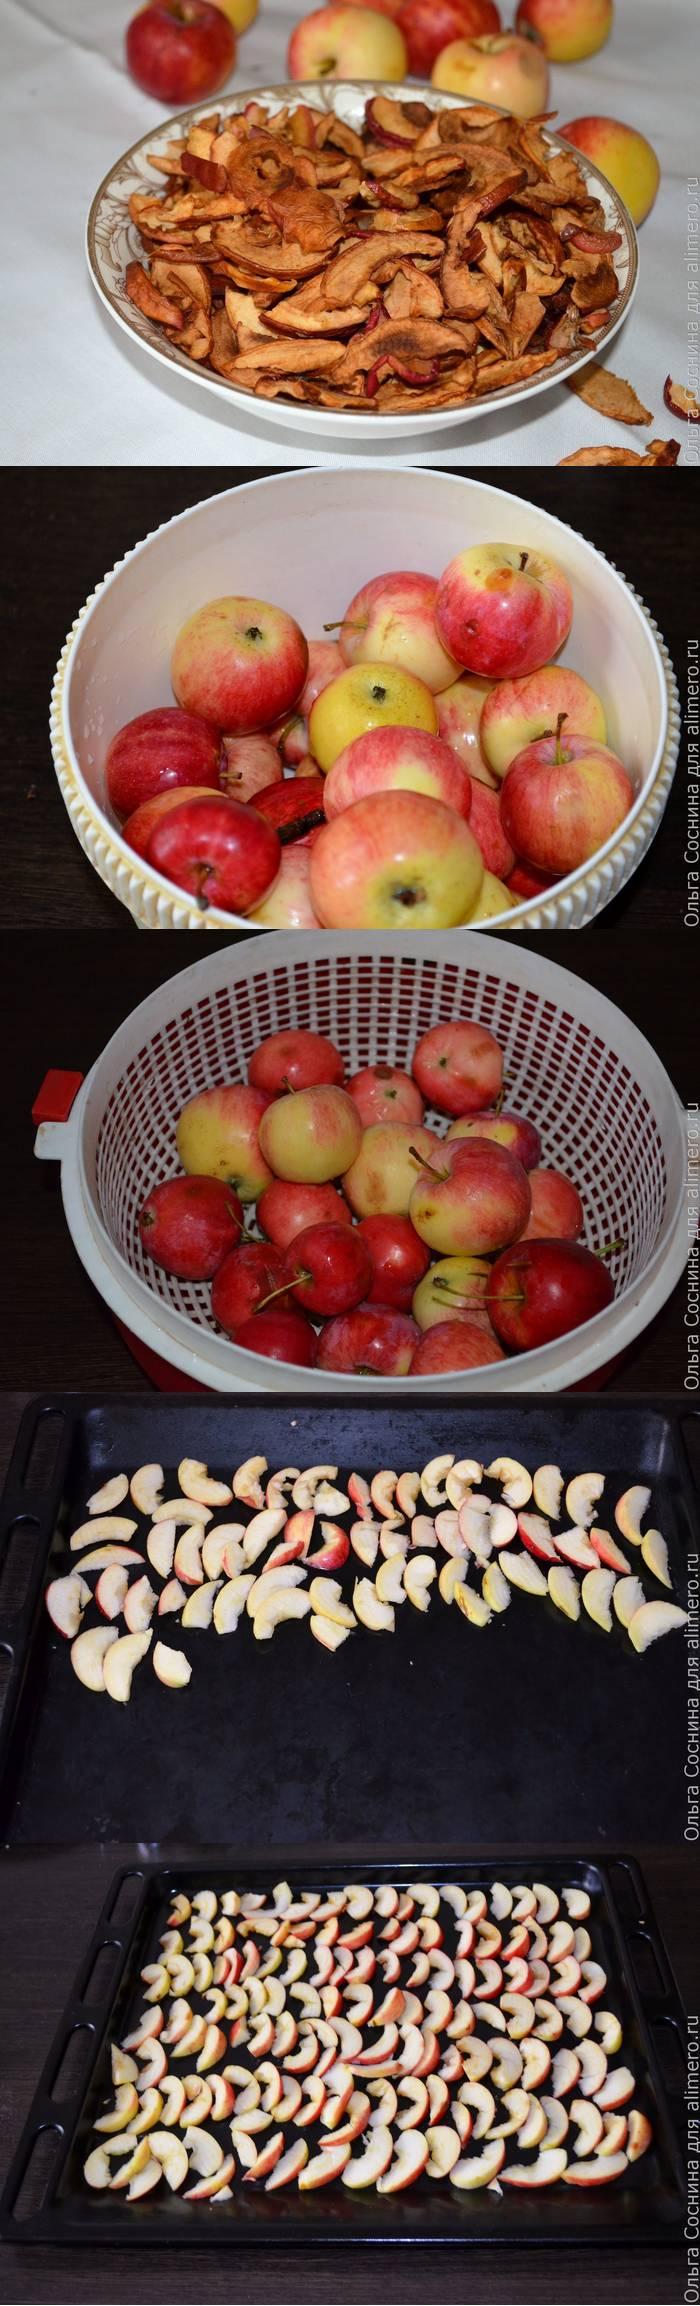 Заготовка яблок на зиму старейшим способом